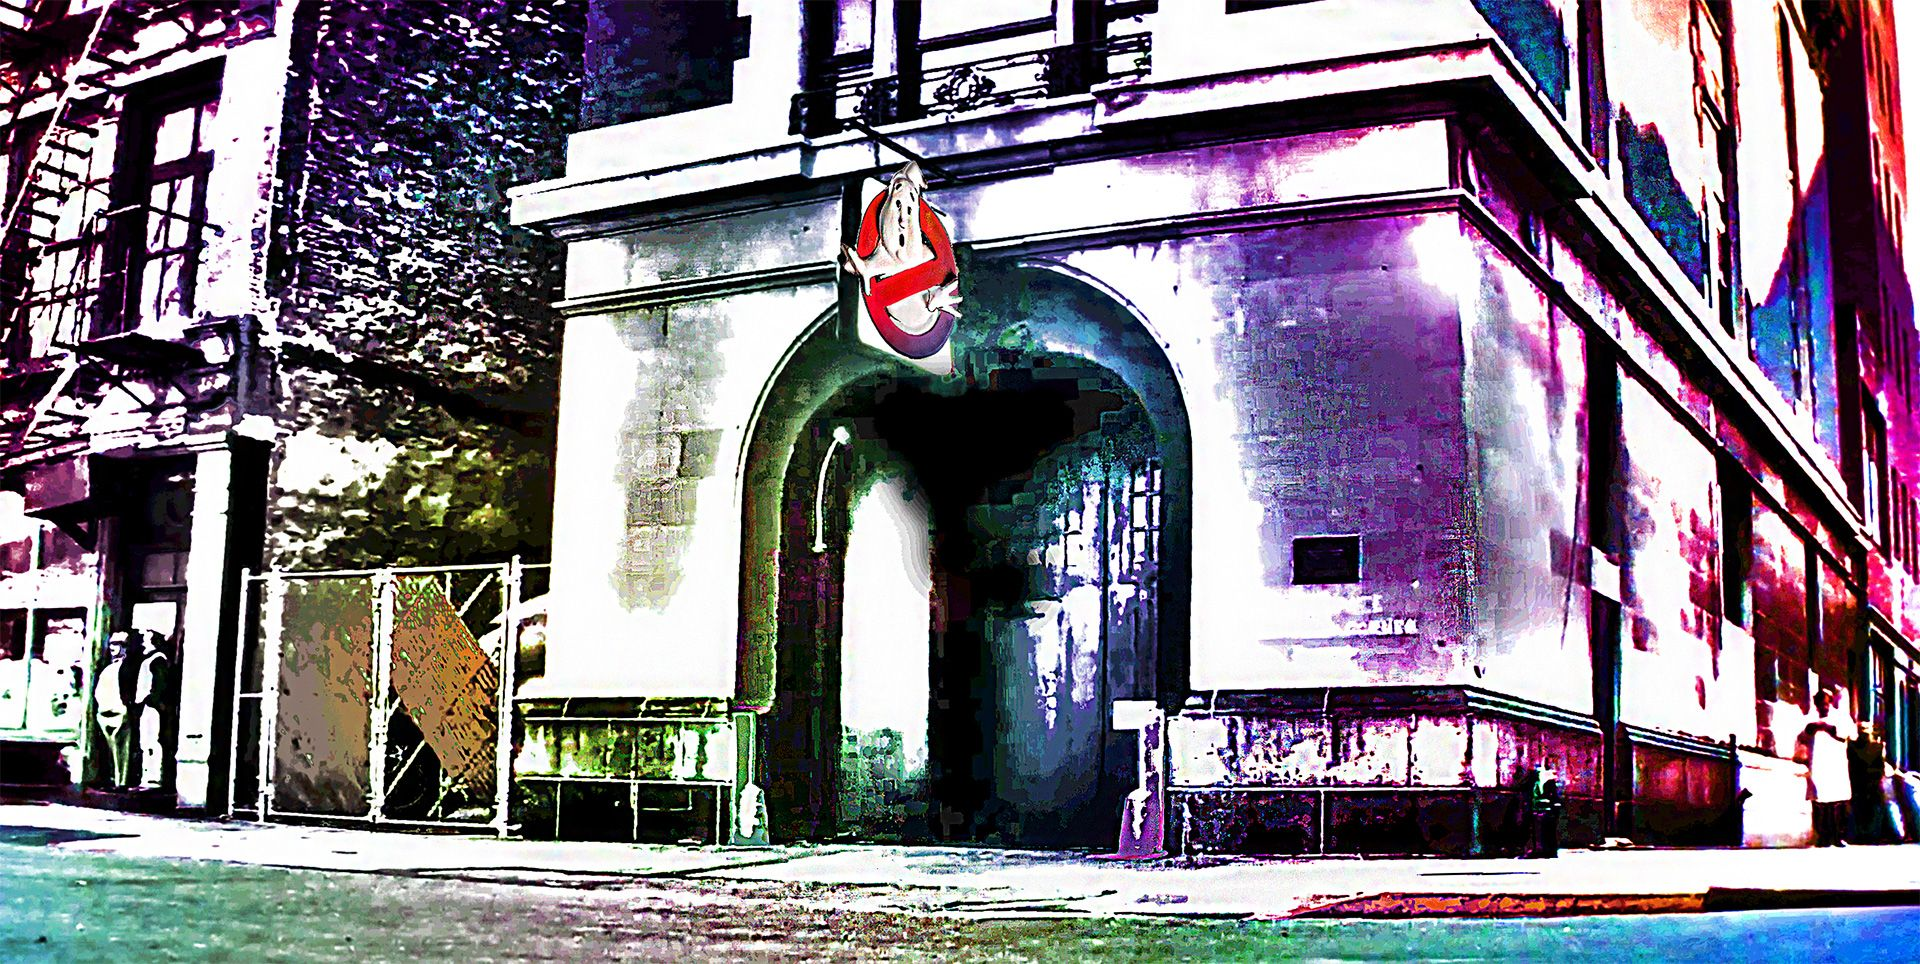 Ghostbusters HQ art